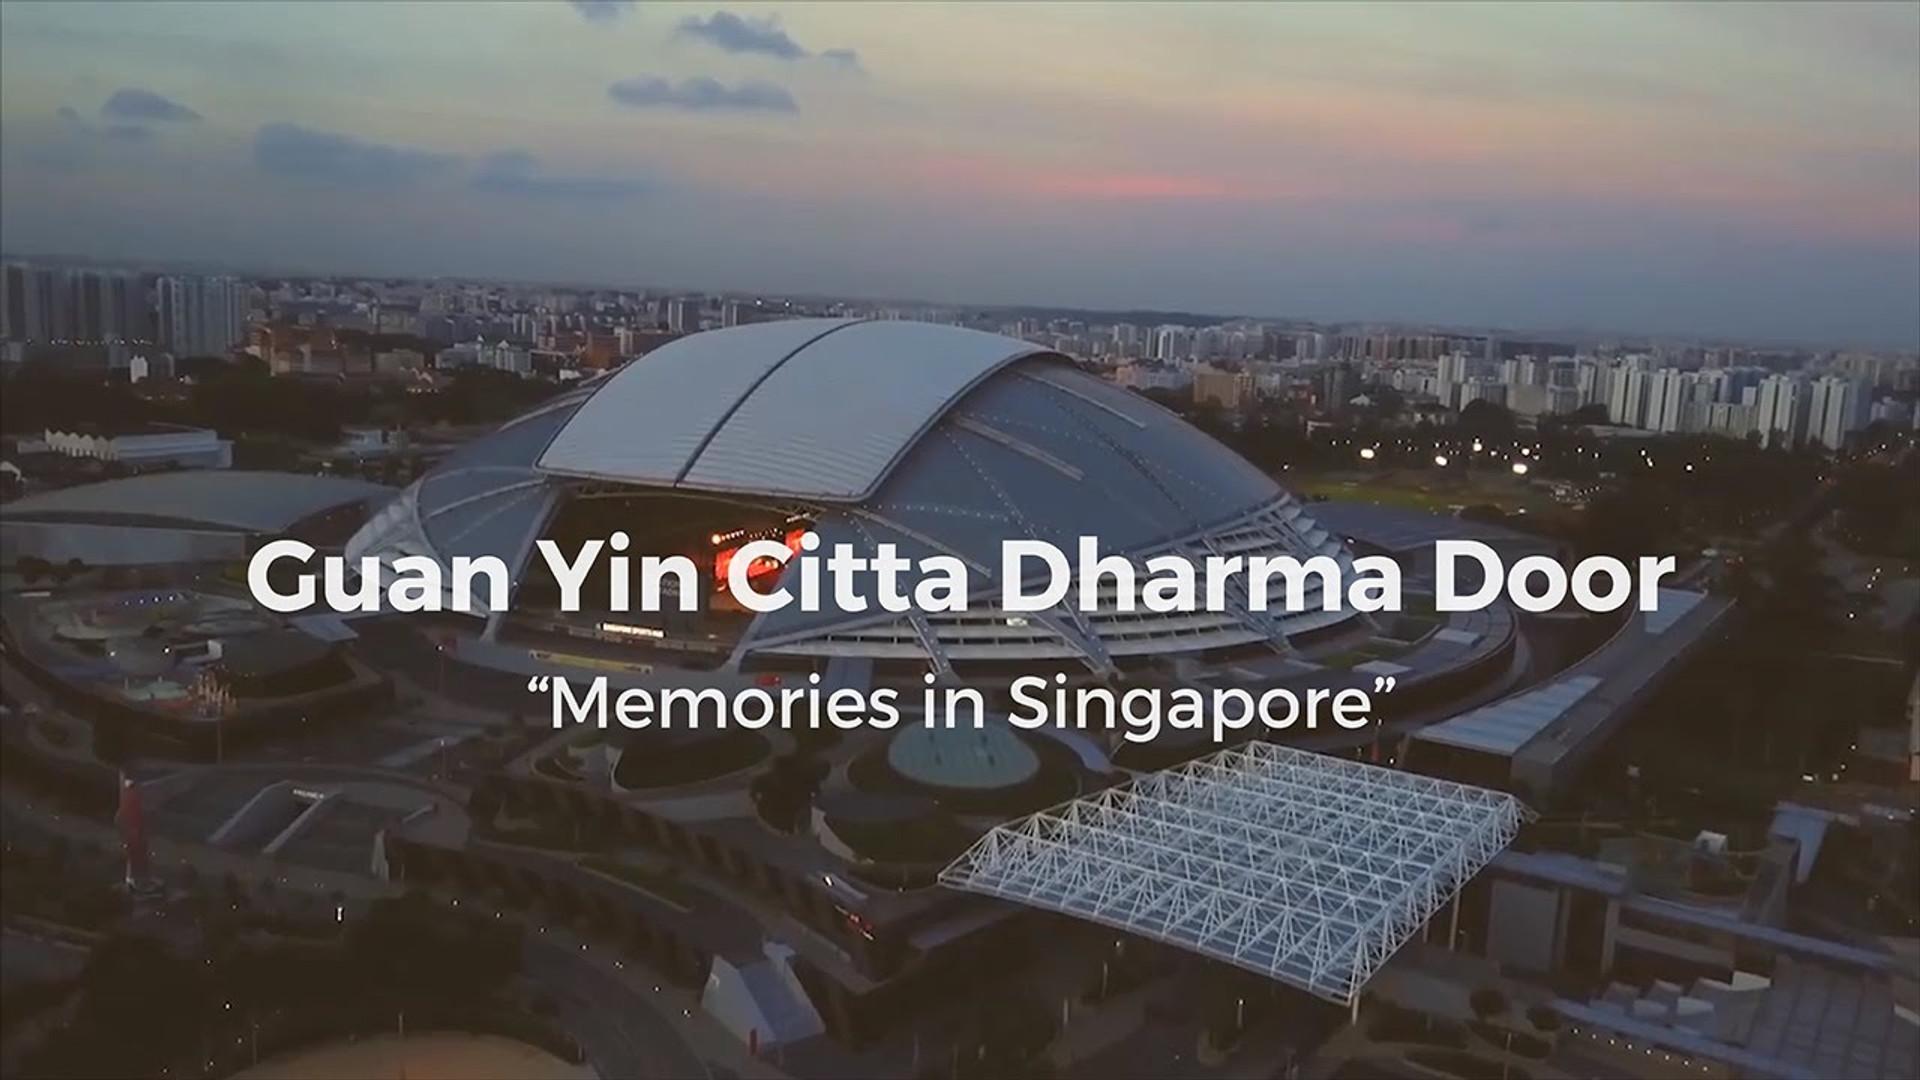 Memories in Singapore